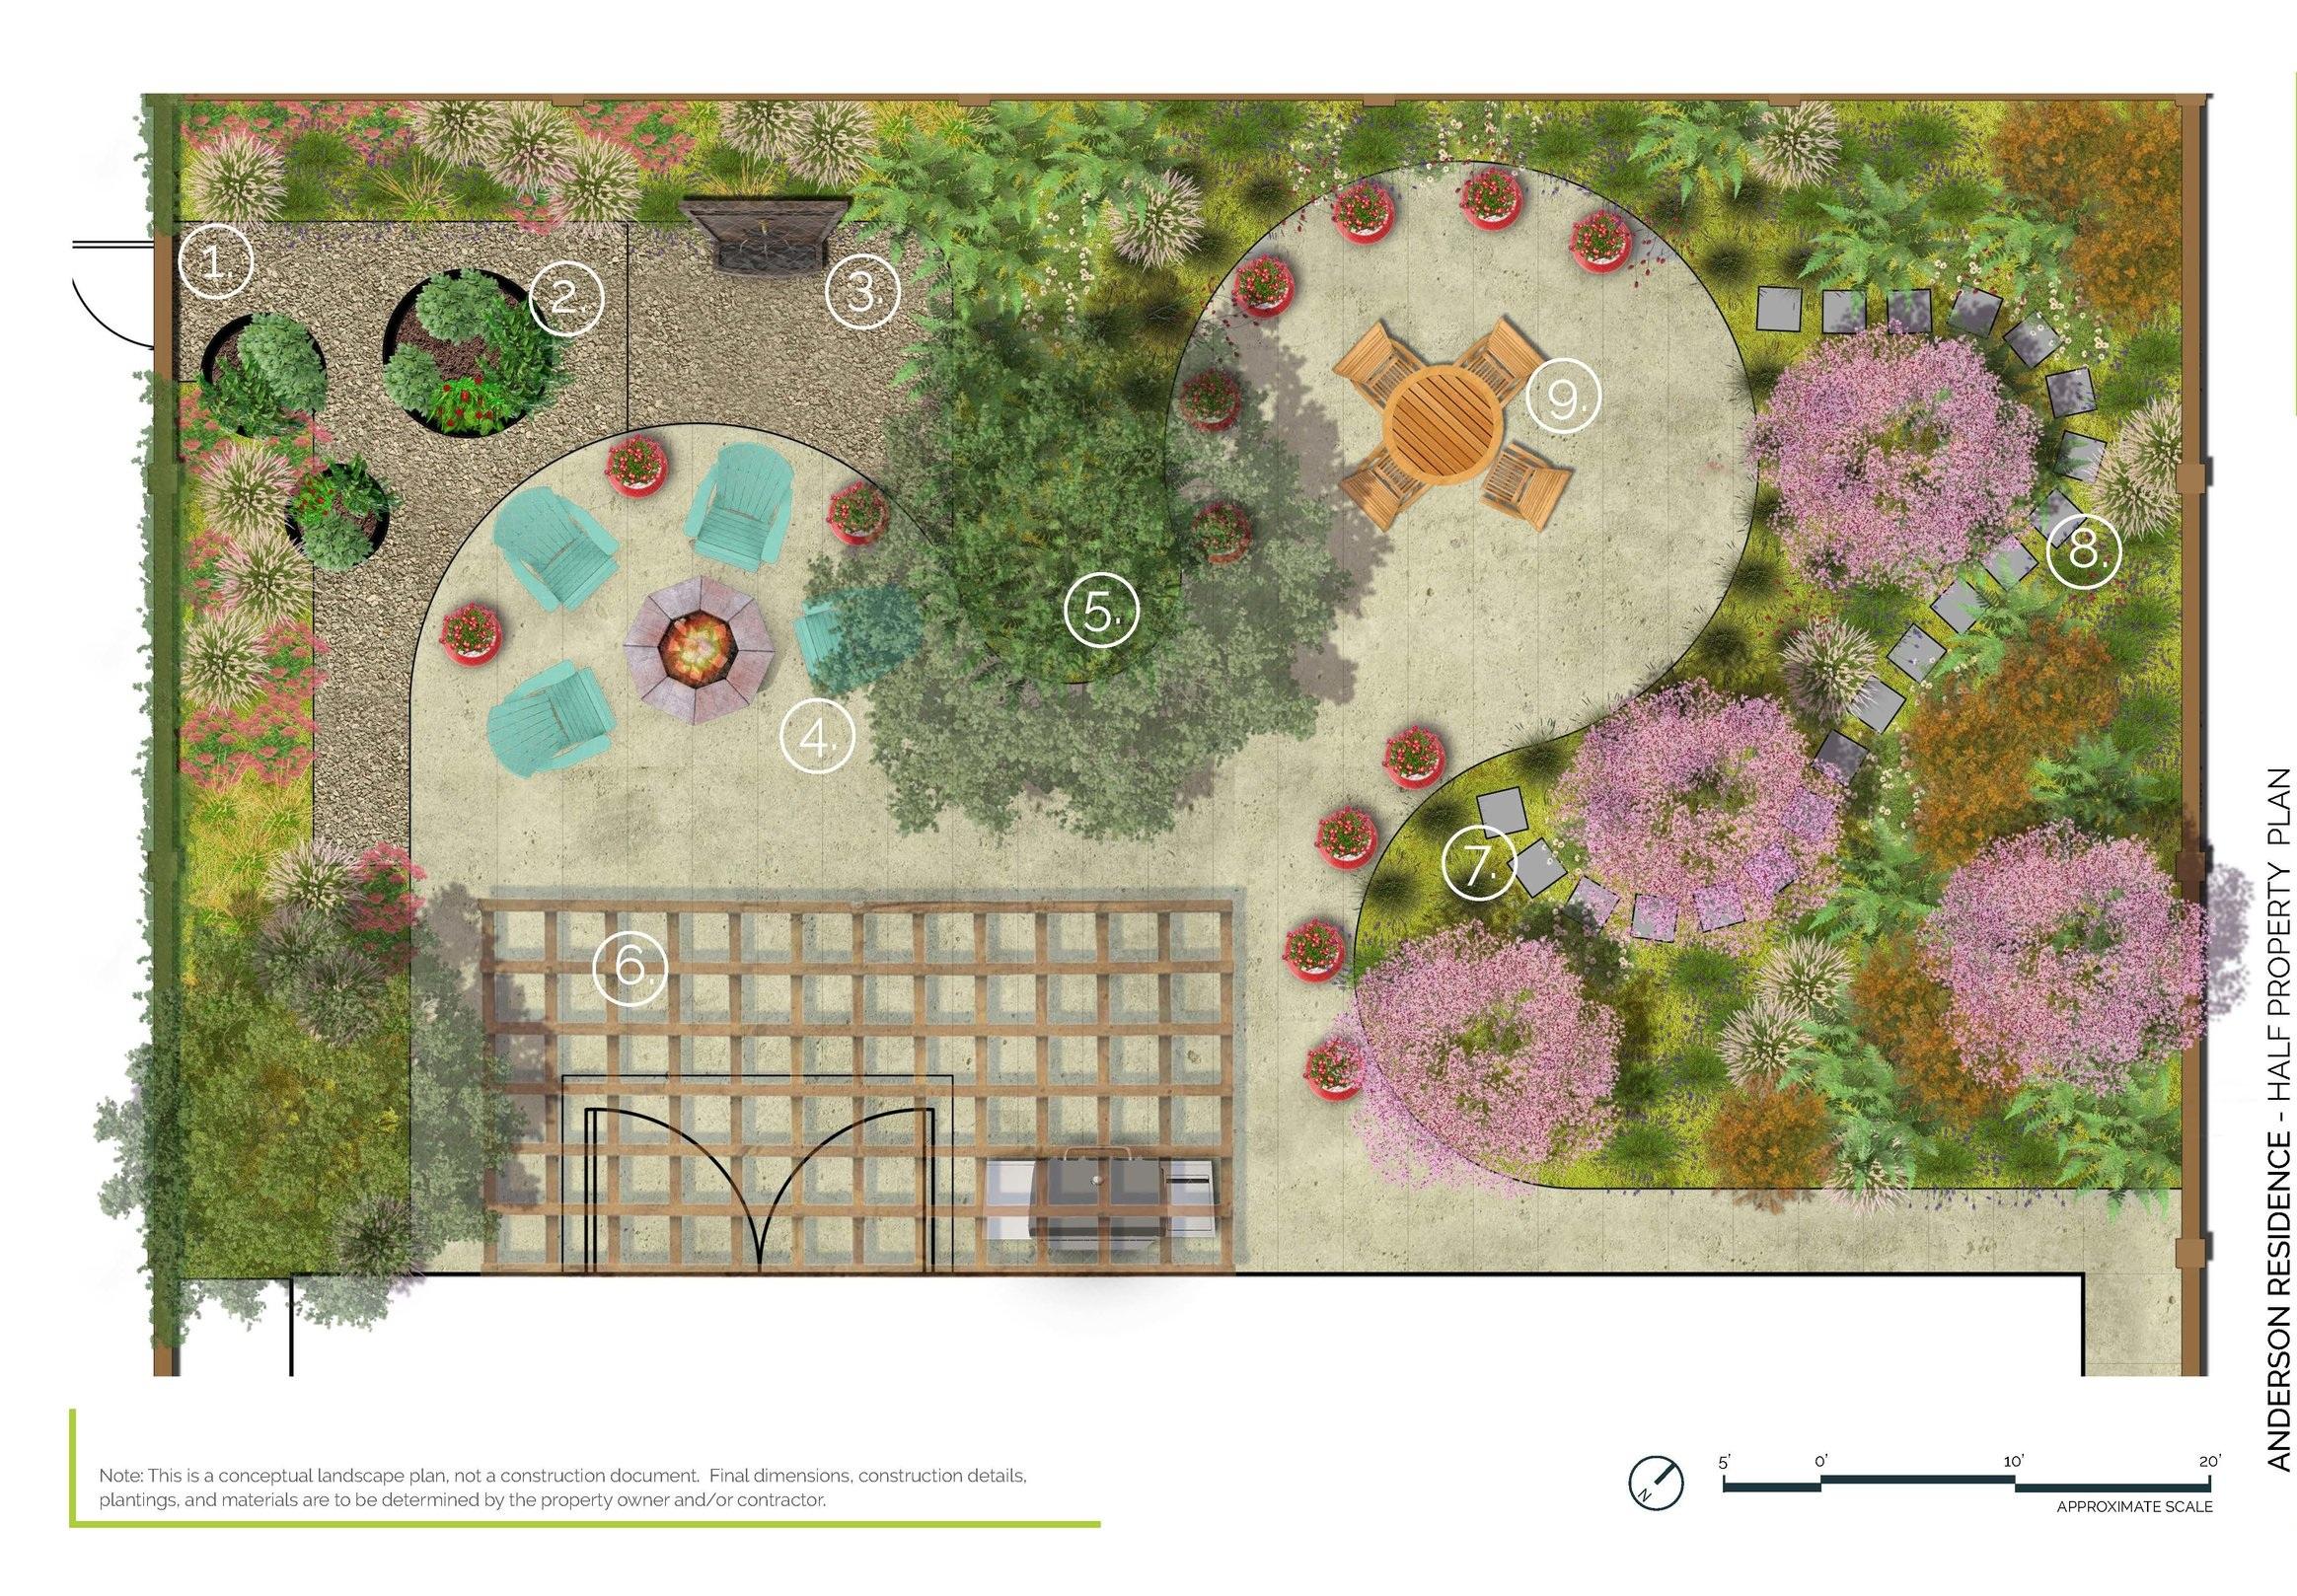 Backyard Refresh - Half Property PlanModesto, CA